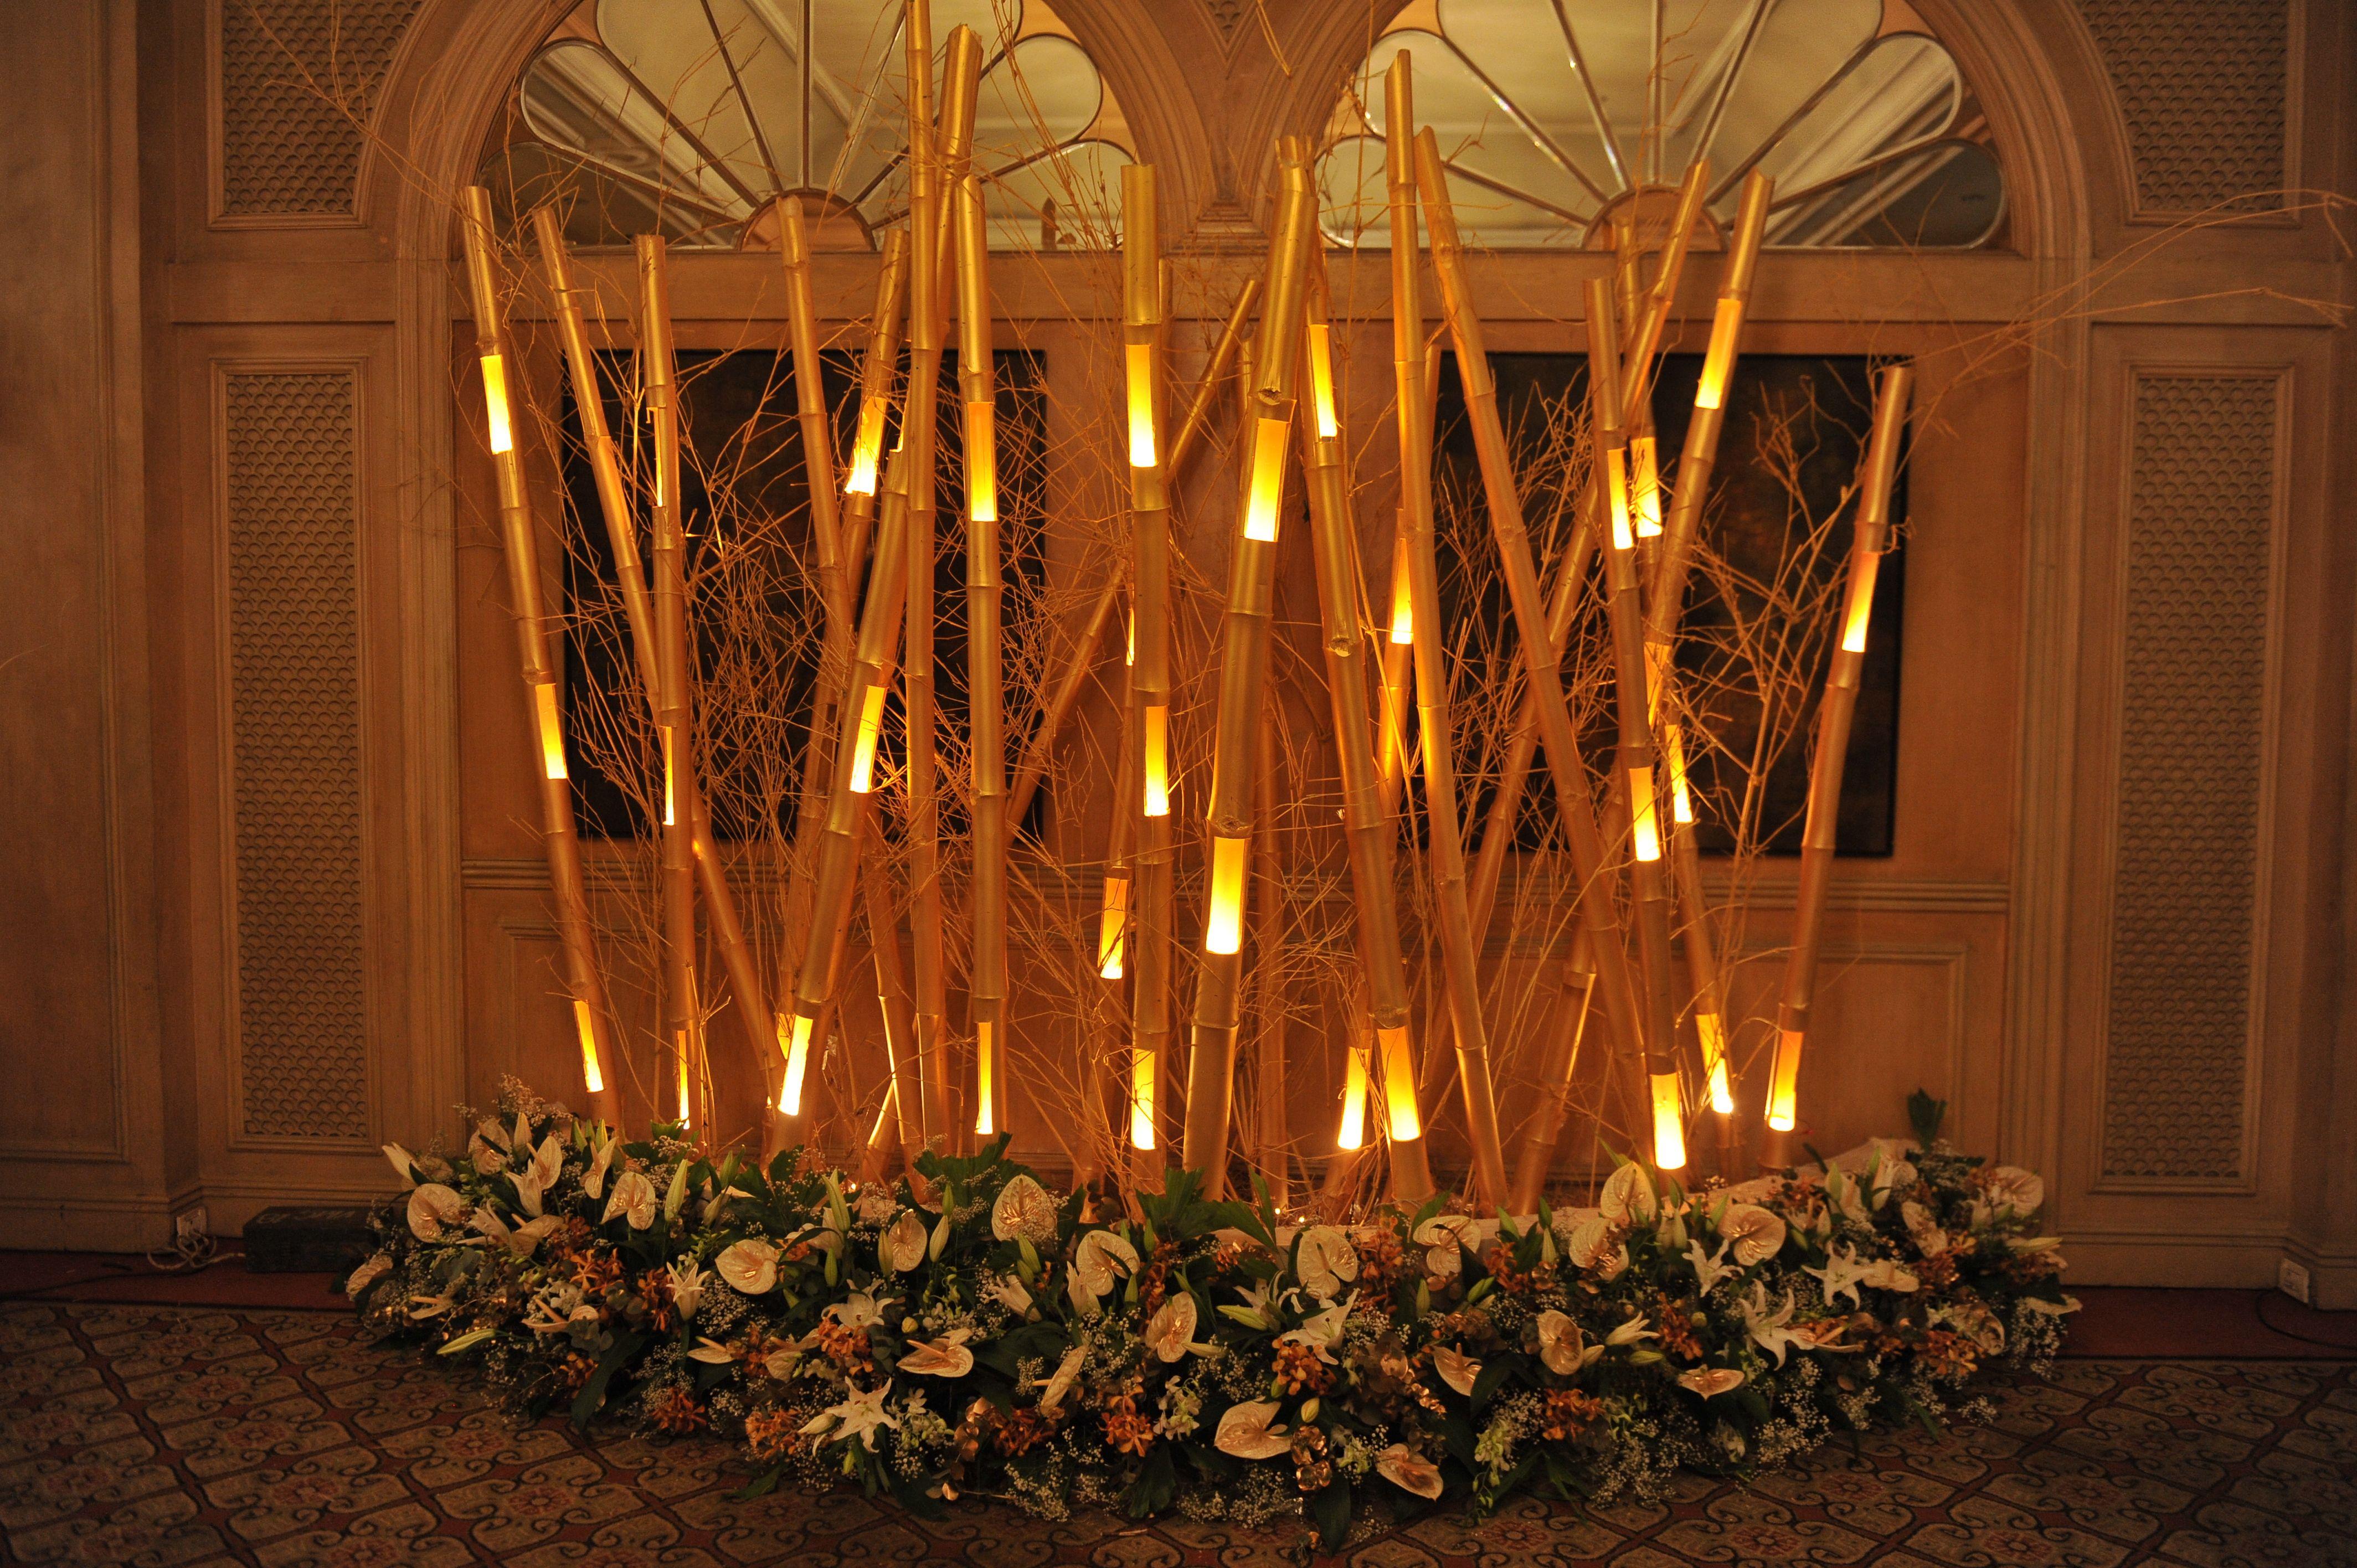 Bamboo Sticks And Flowers Decor Bamboo Decor Bamboo Light